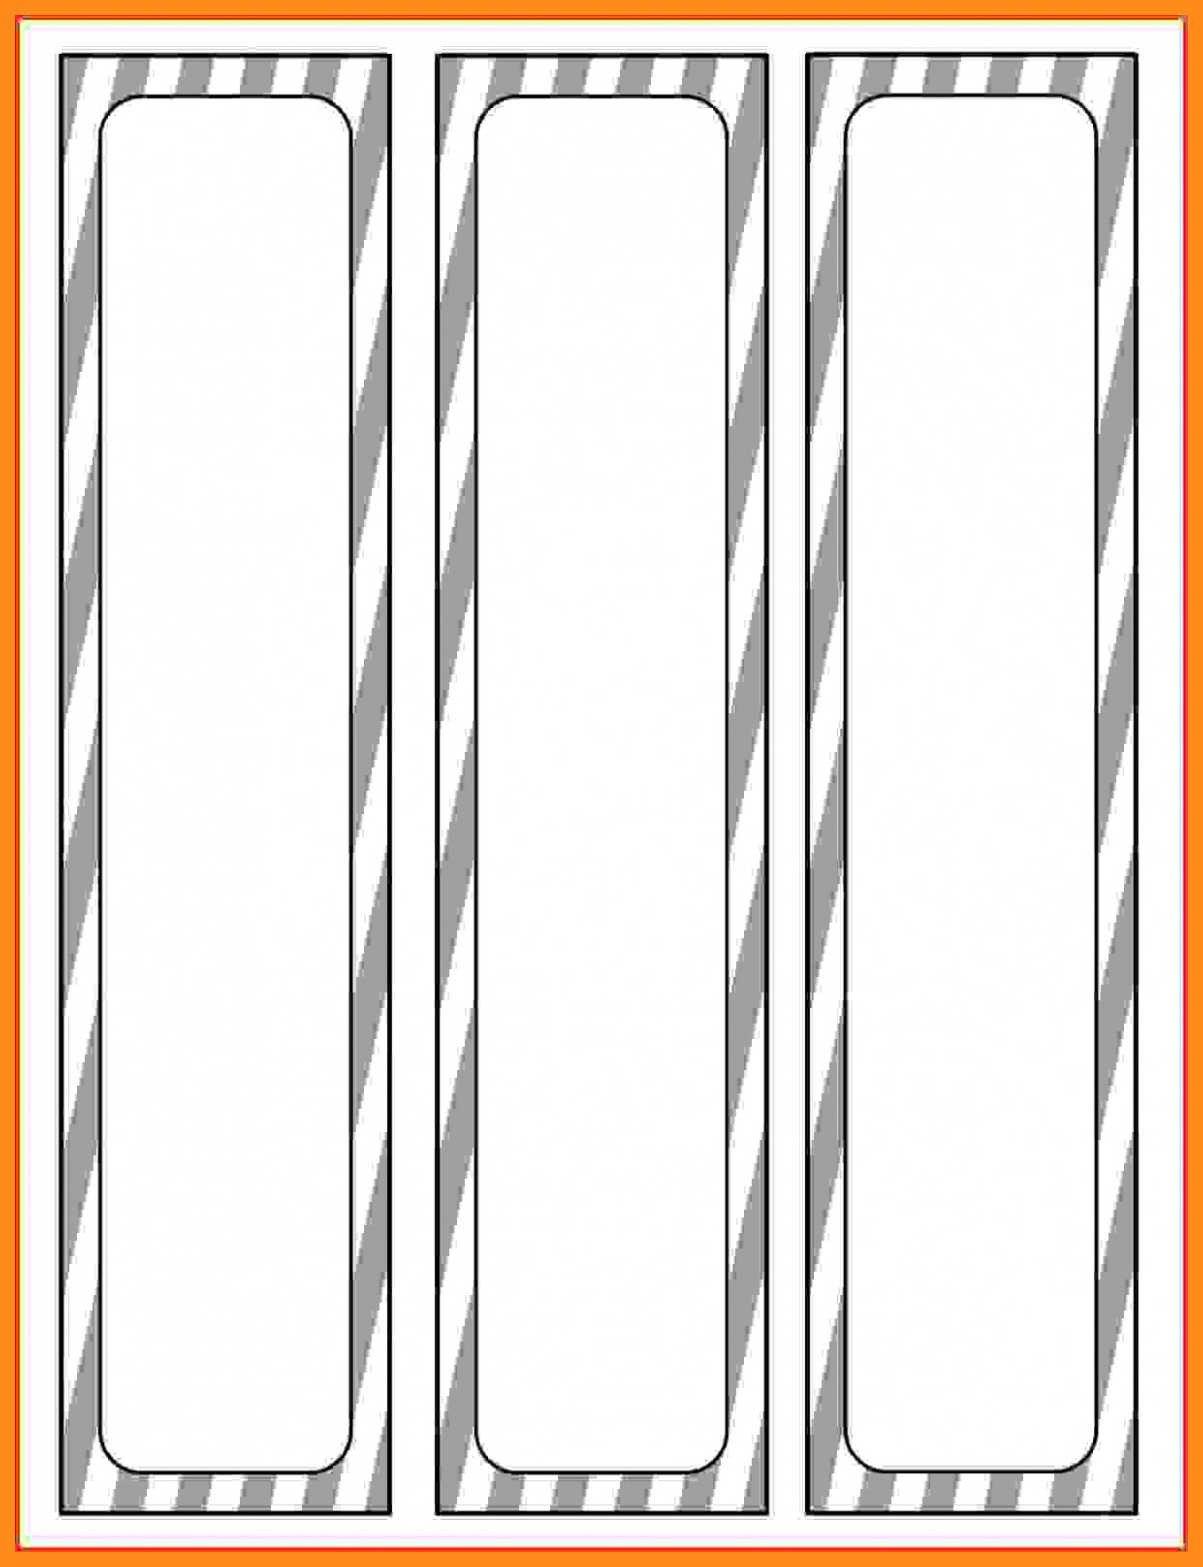 Three Ring Binder Spine Template 12 13 Microsoft Binder Spine Templates